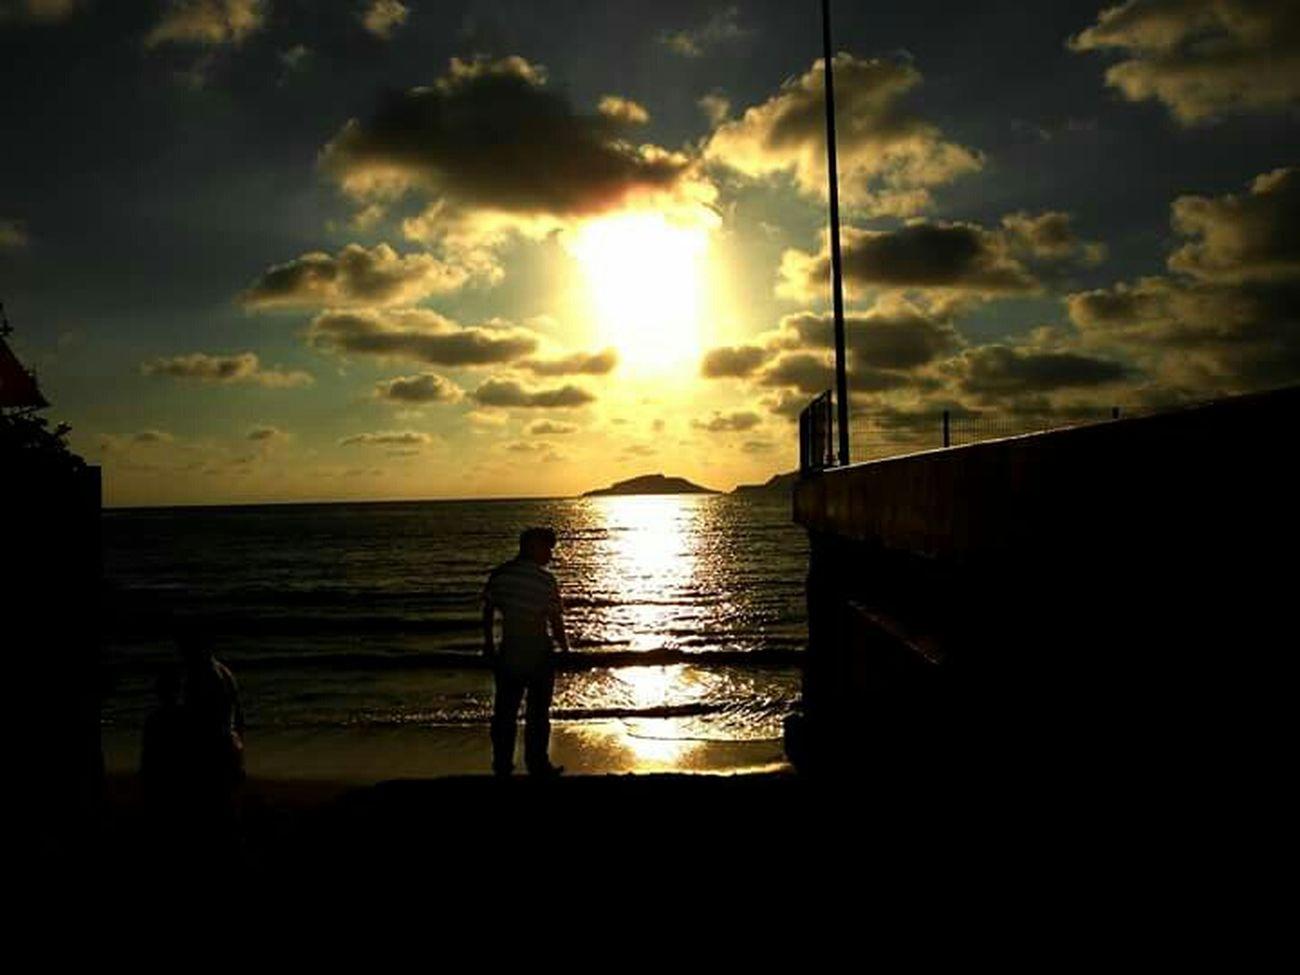 El mar tan relajante como la lluvia Expression Emosional Asdfghjkl Paisaje Natural Natural Paisaje Atardecer Mazatlan🌊 Cielo